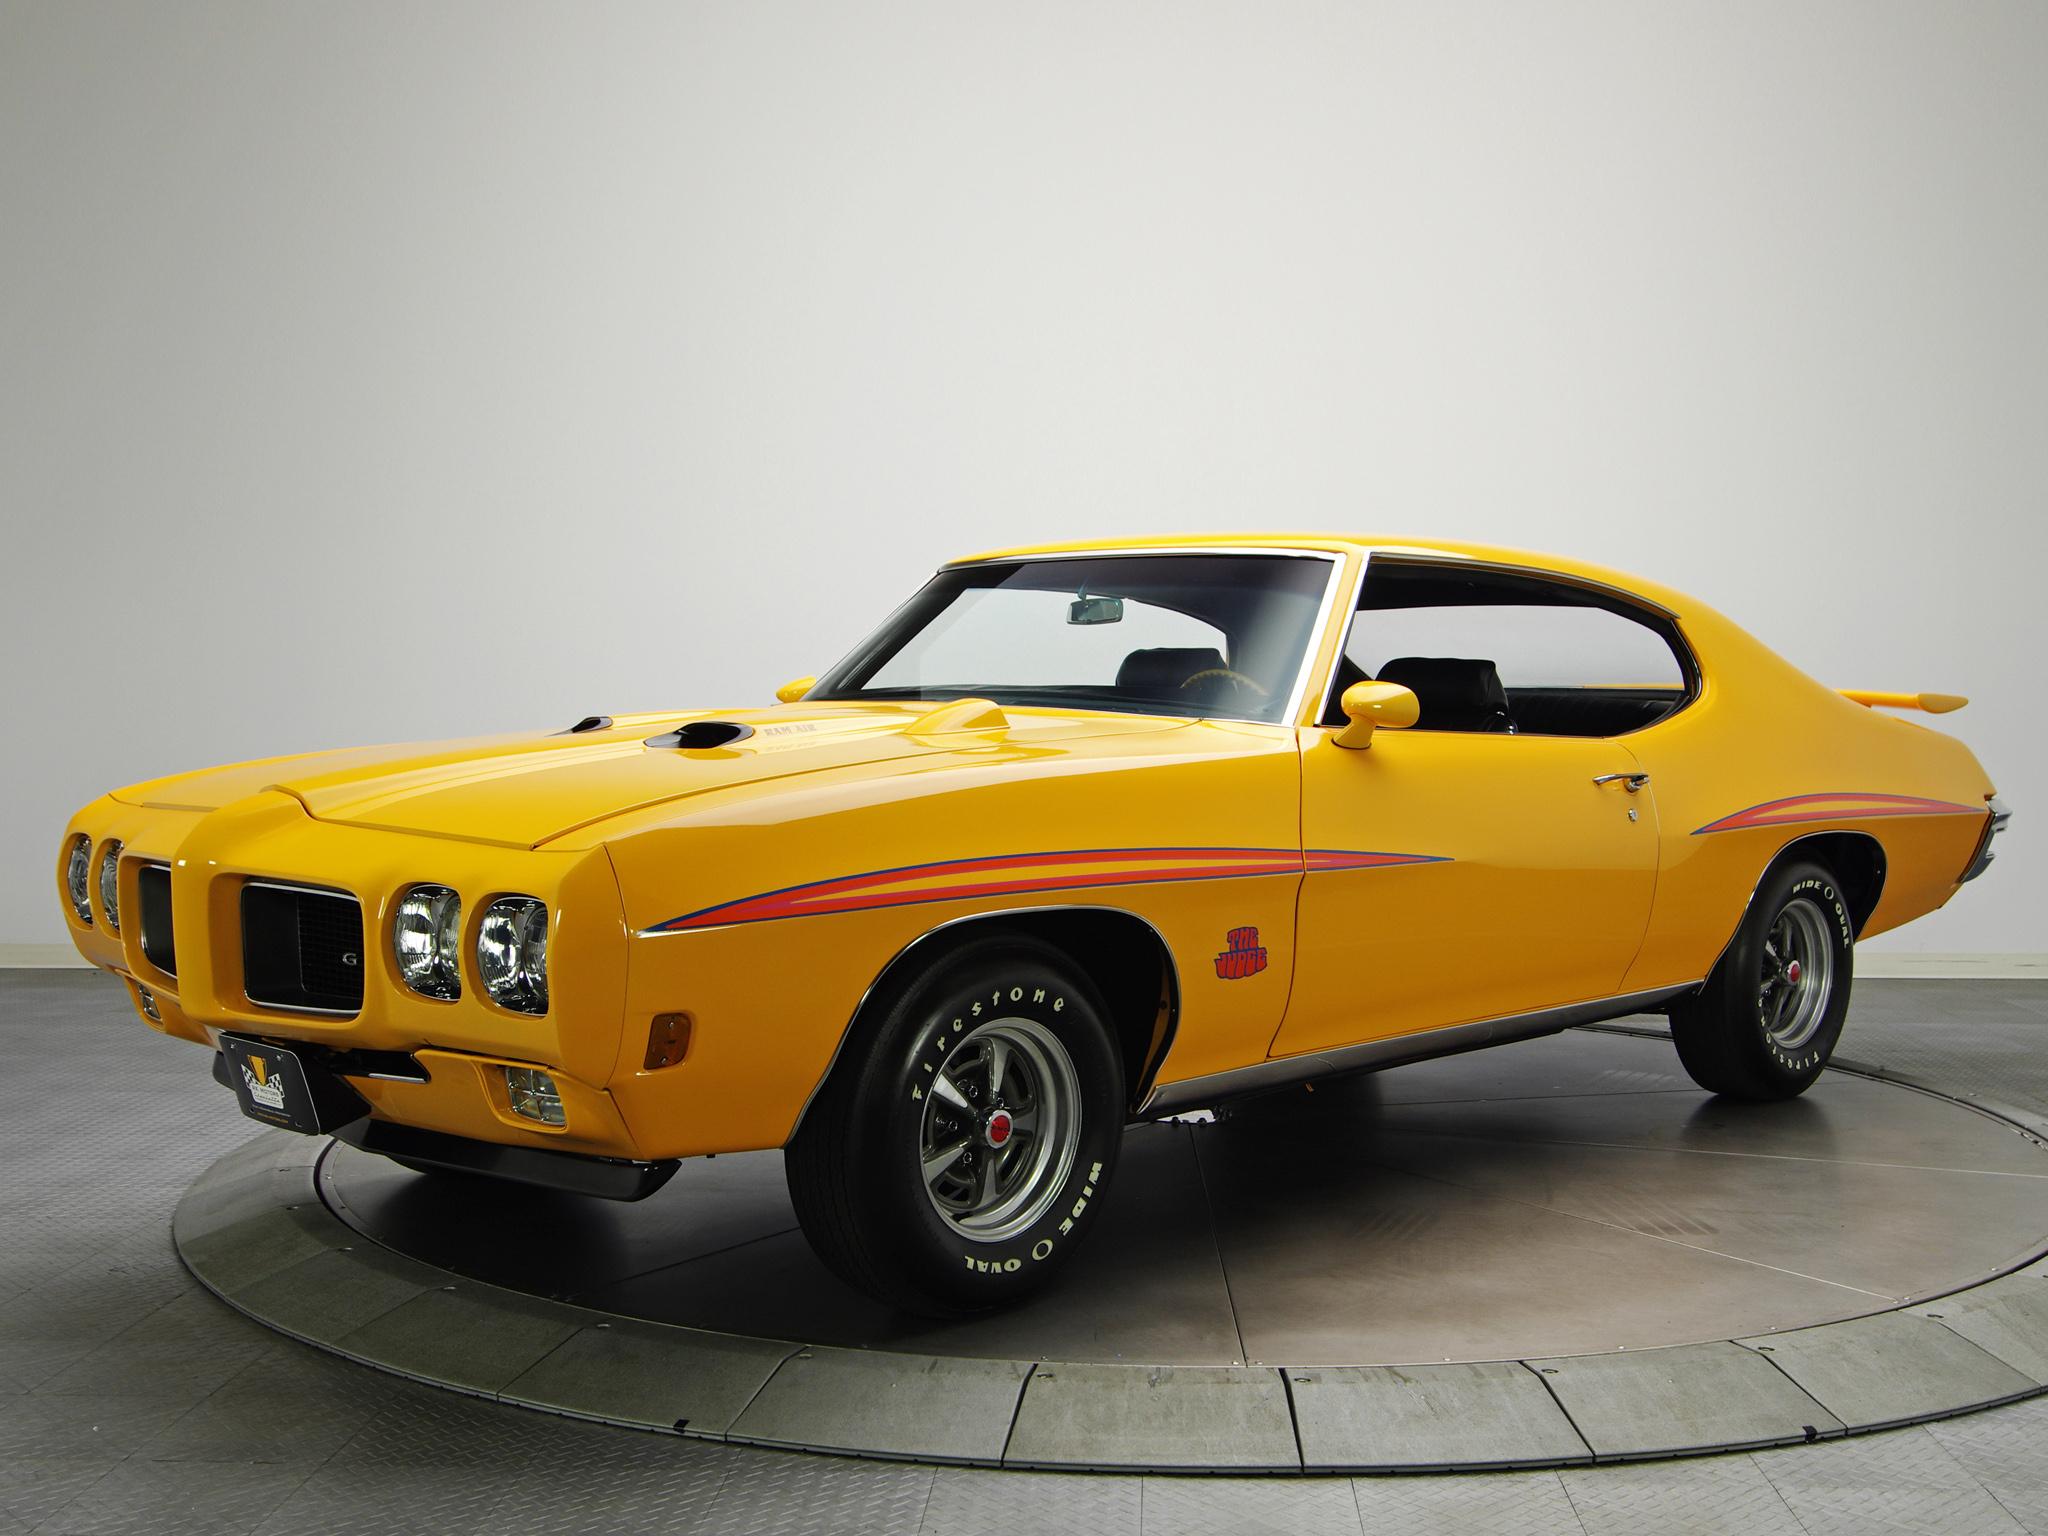 1970 Pontiac Gto Wallpaper   image 156 2048x1536